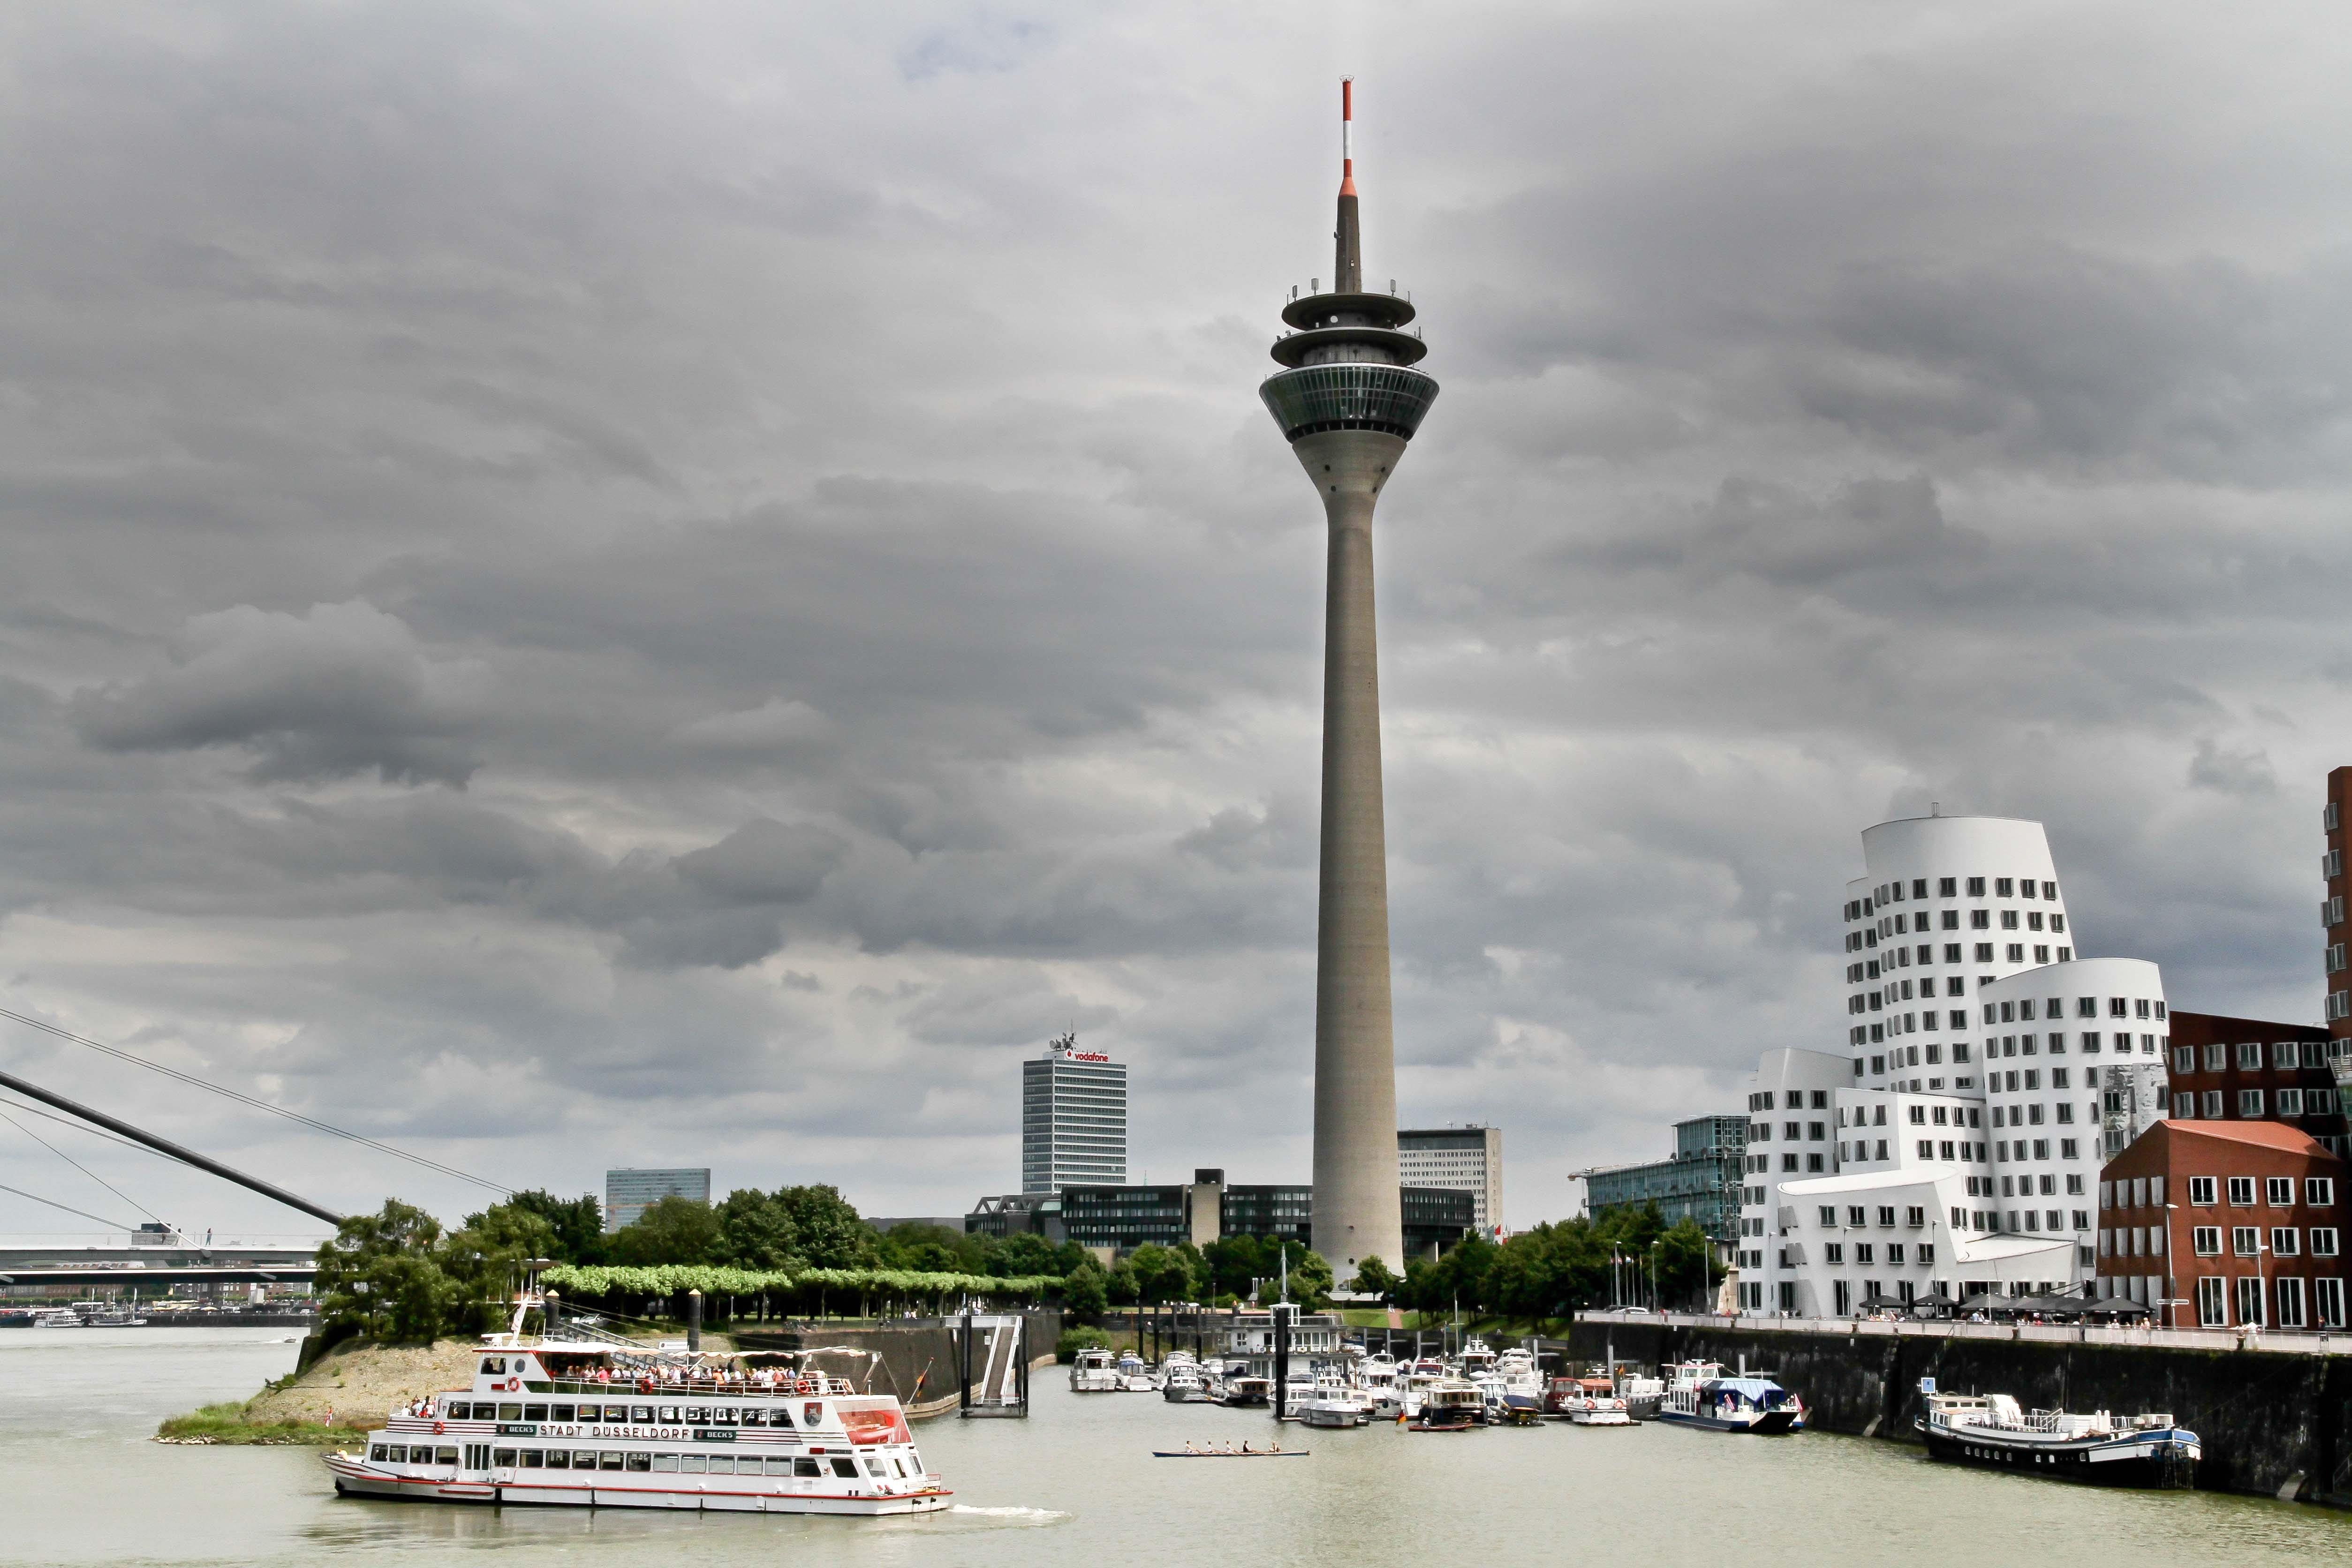 Free stock photo of city, landmark, water, clouds